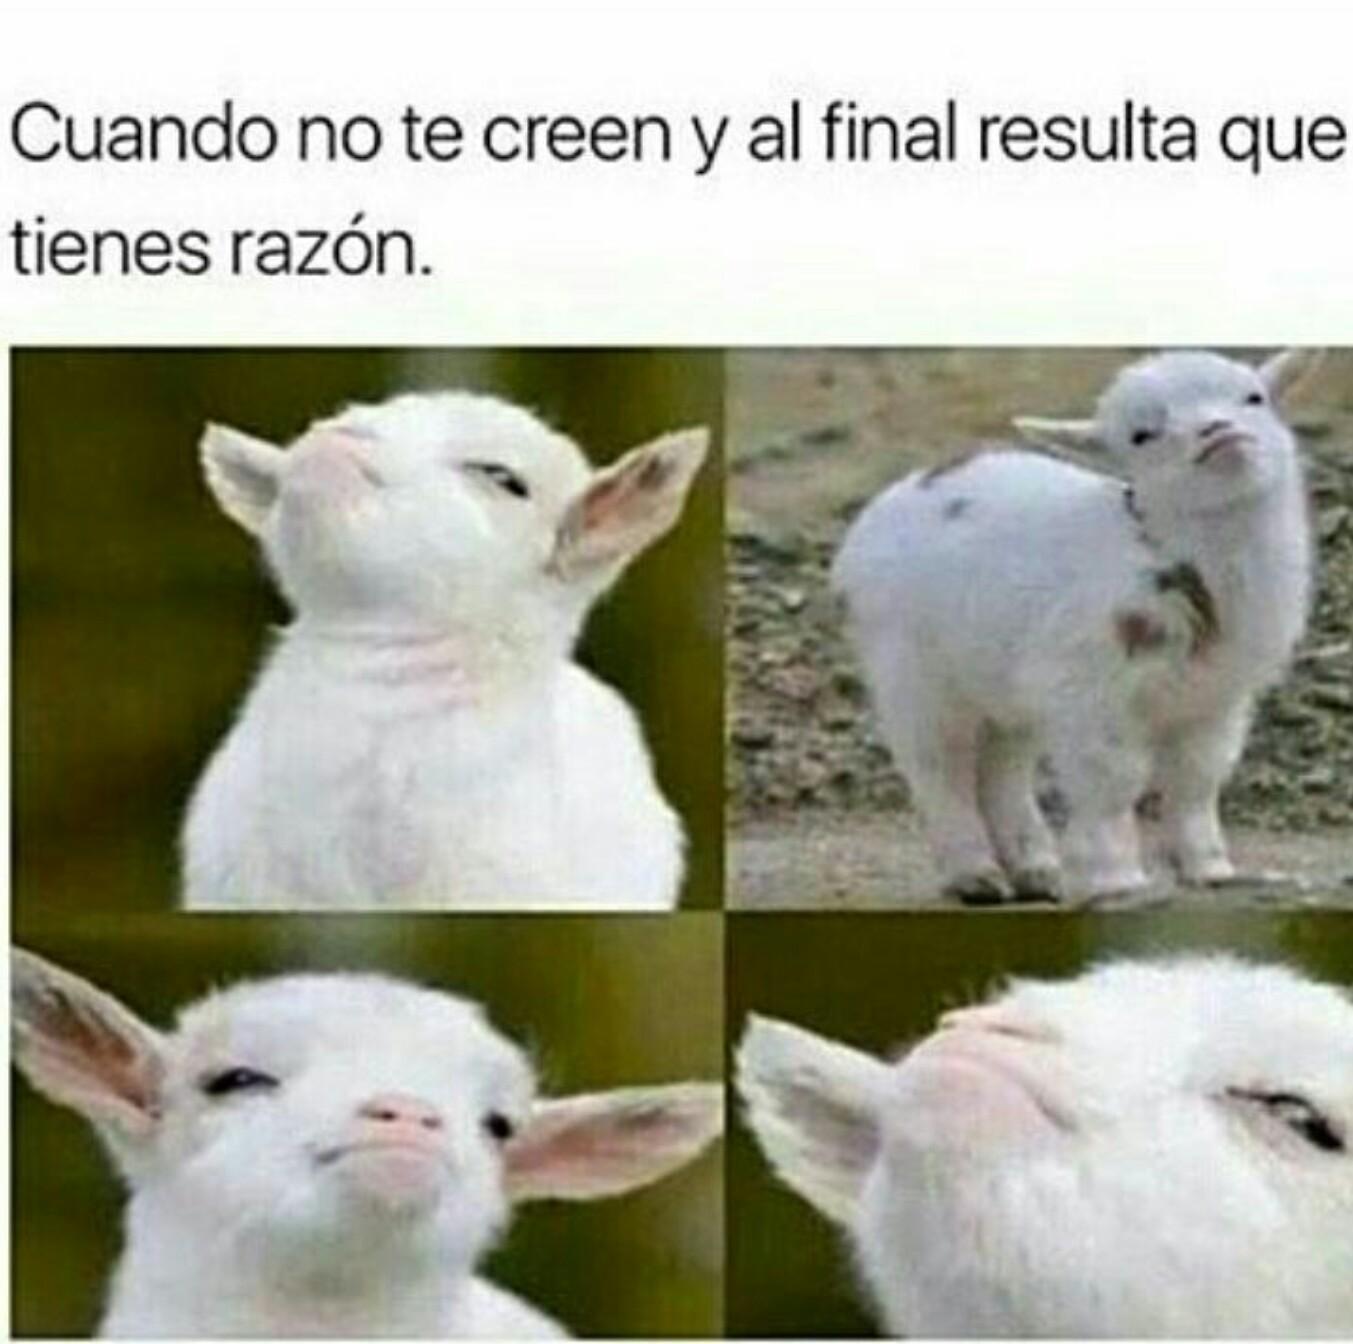 XD cierto jajaja - meme